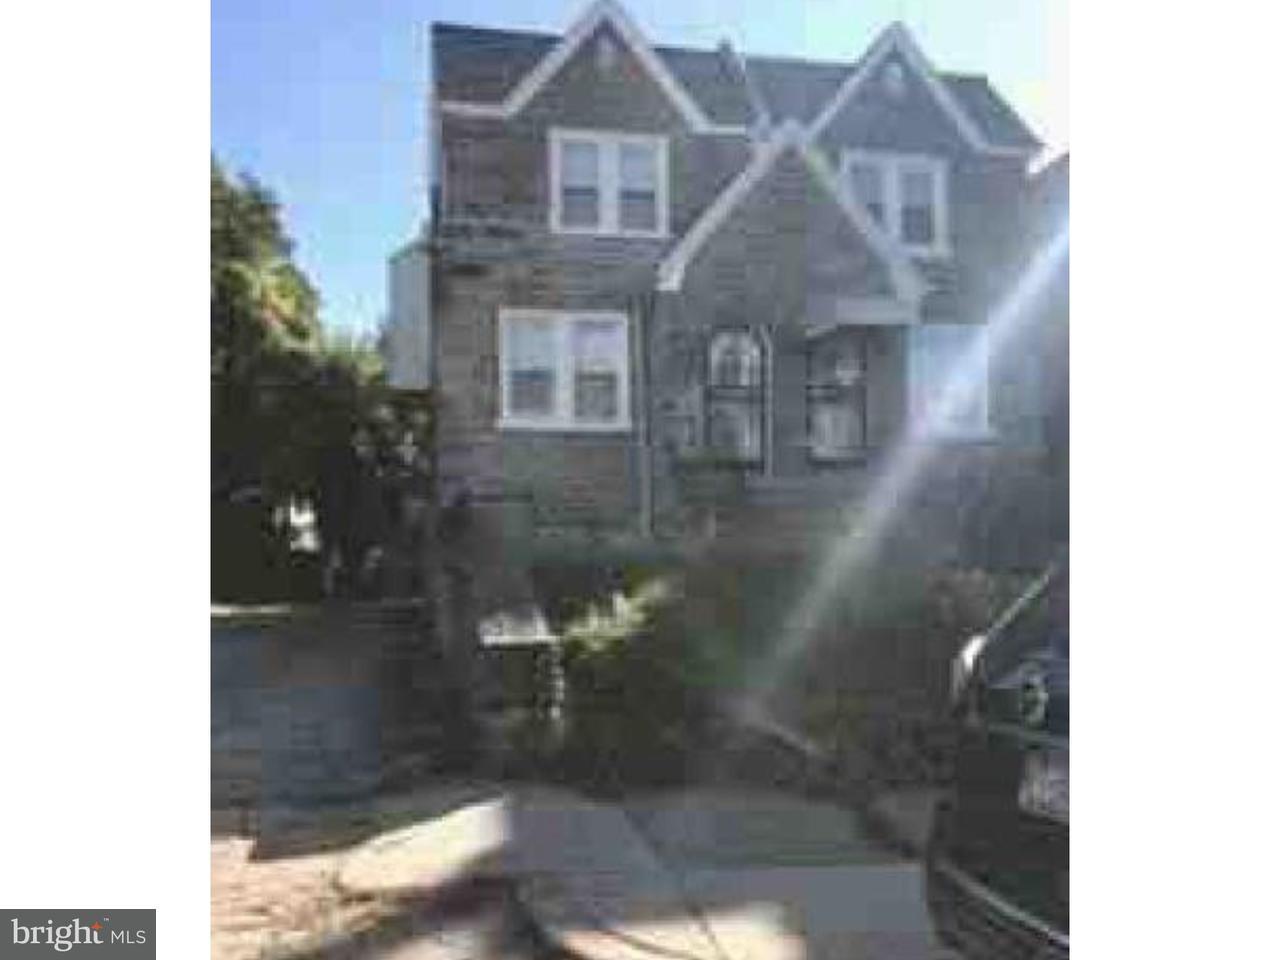 6533 N Park Philadelphia, PA 19126